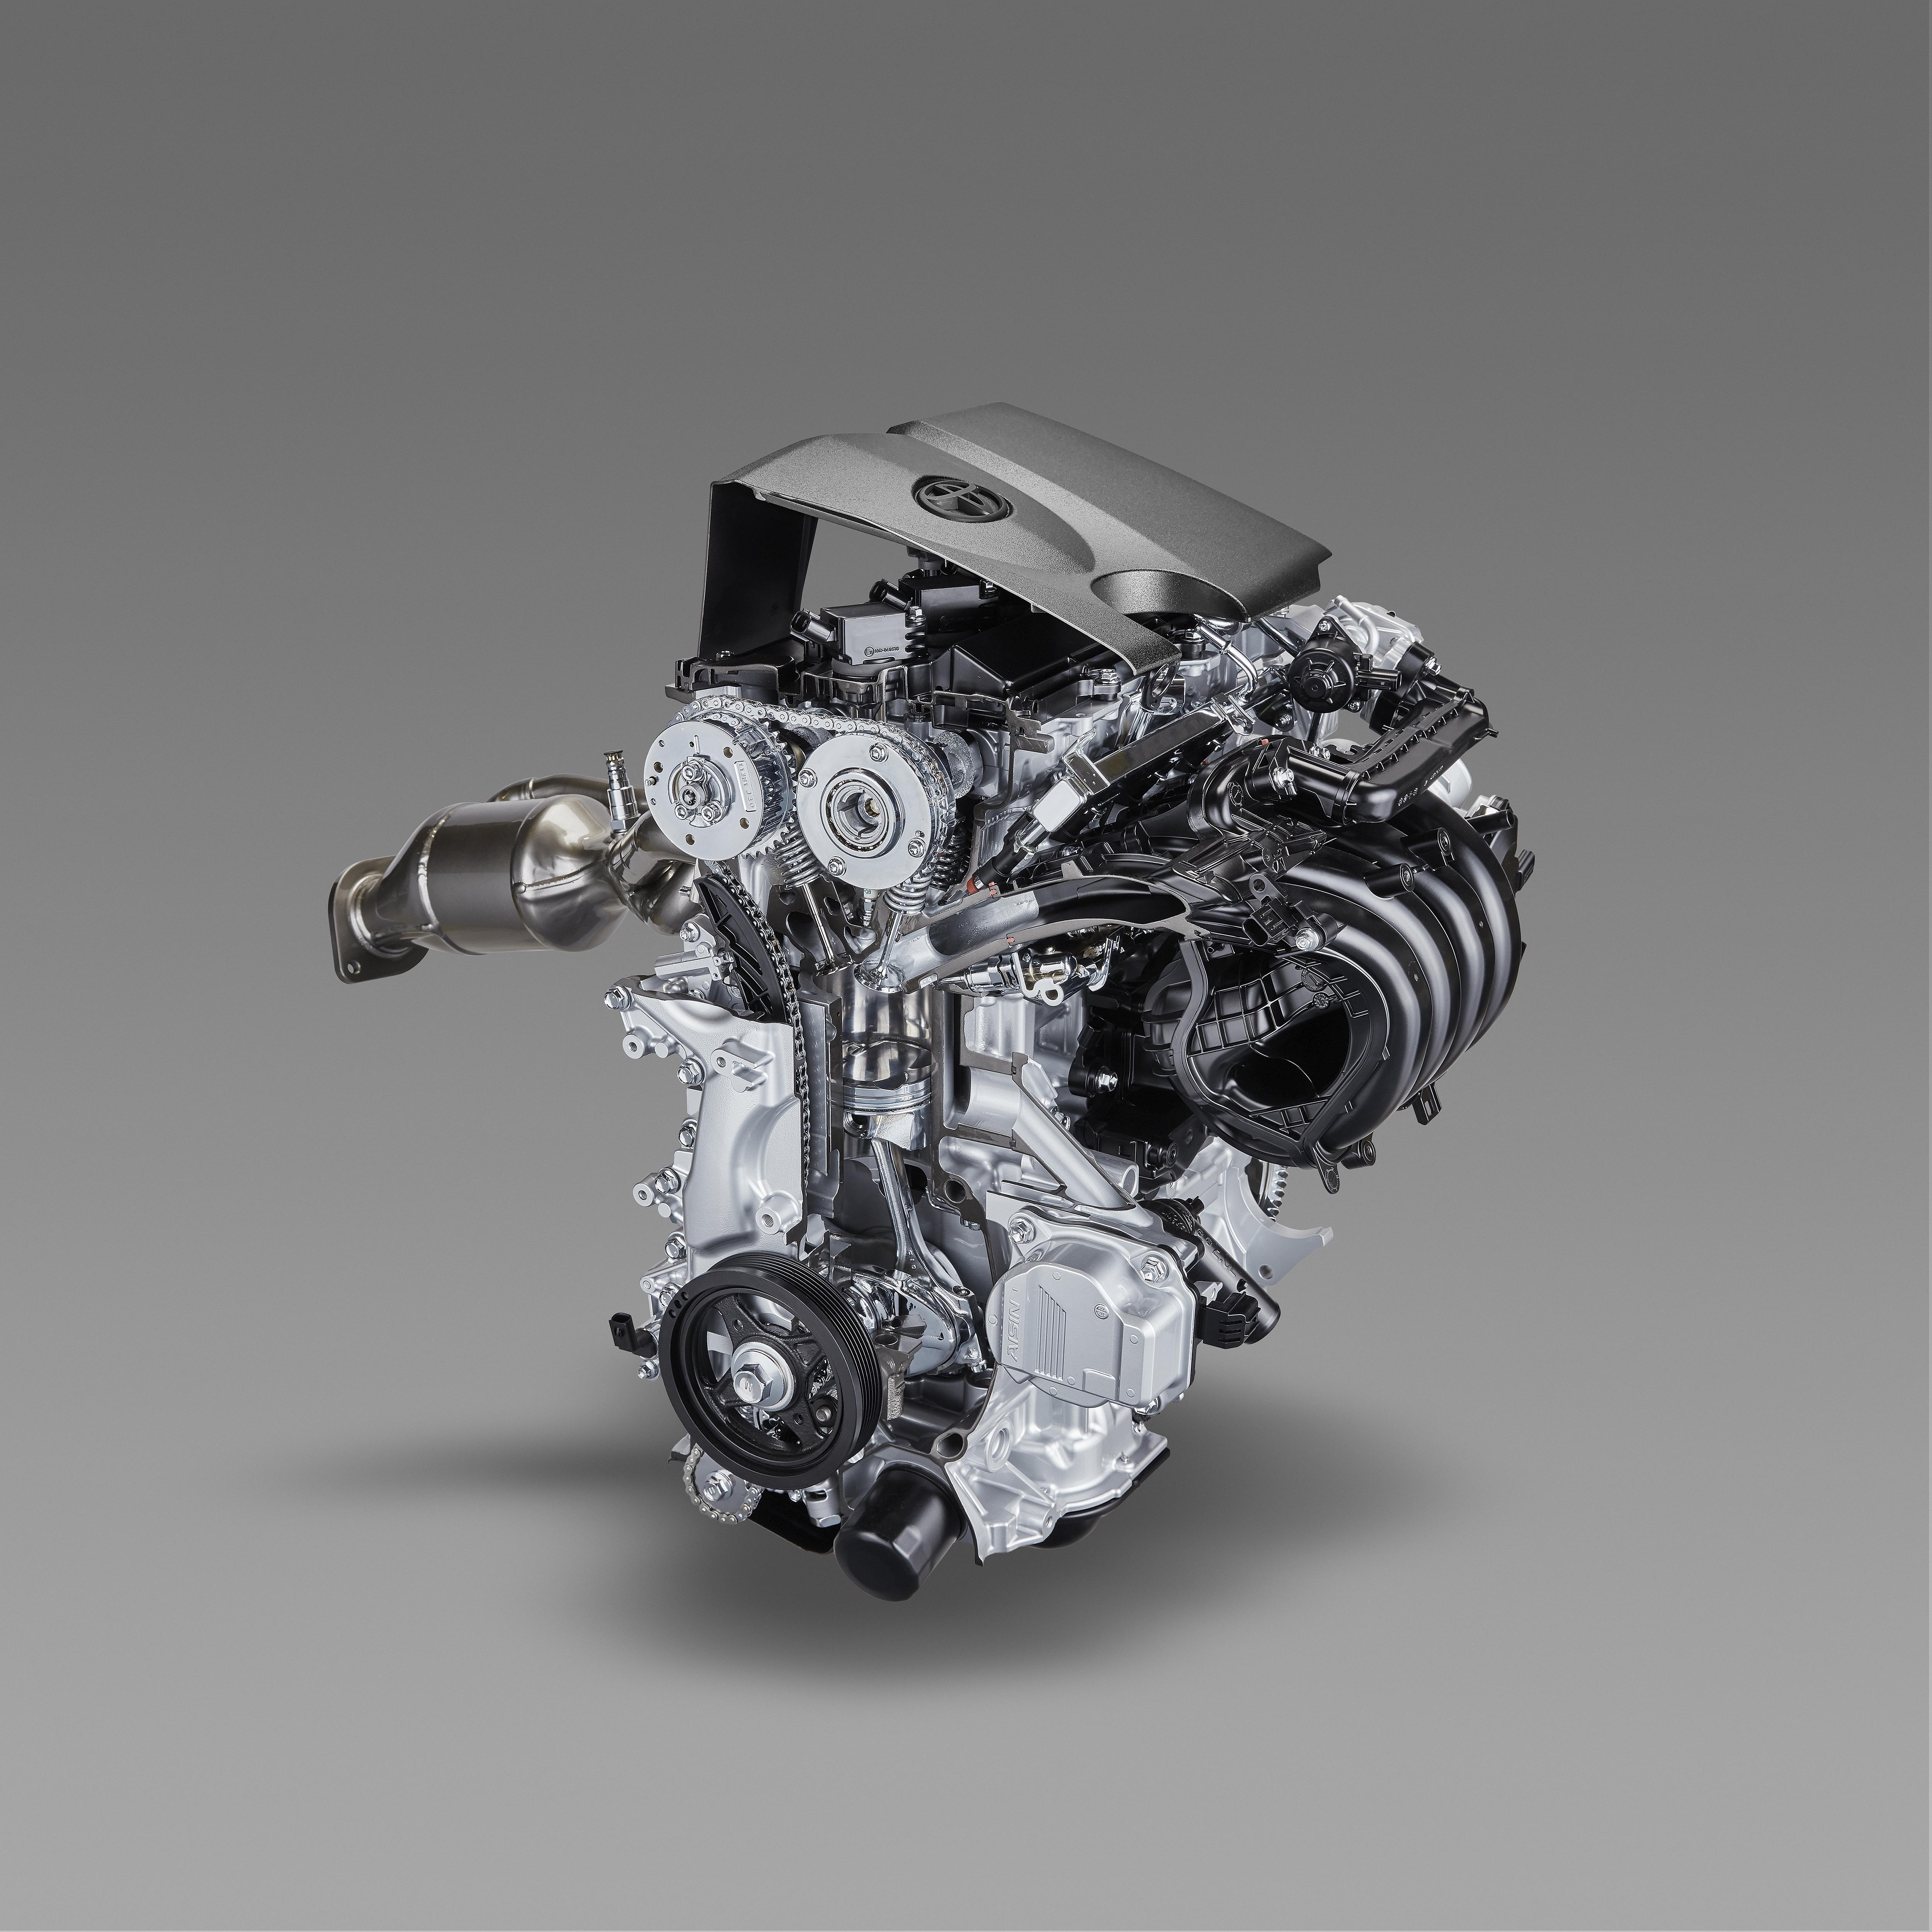 Kelebihan Kekurangan Tnga Toyota Murah Berkualitas